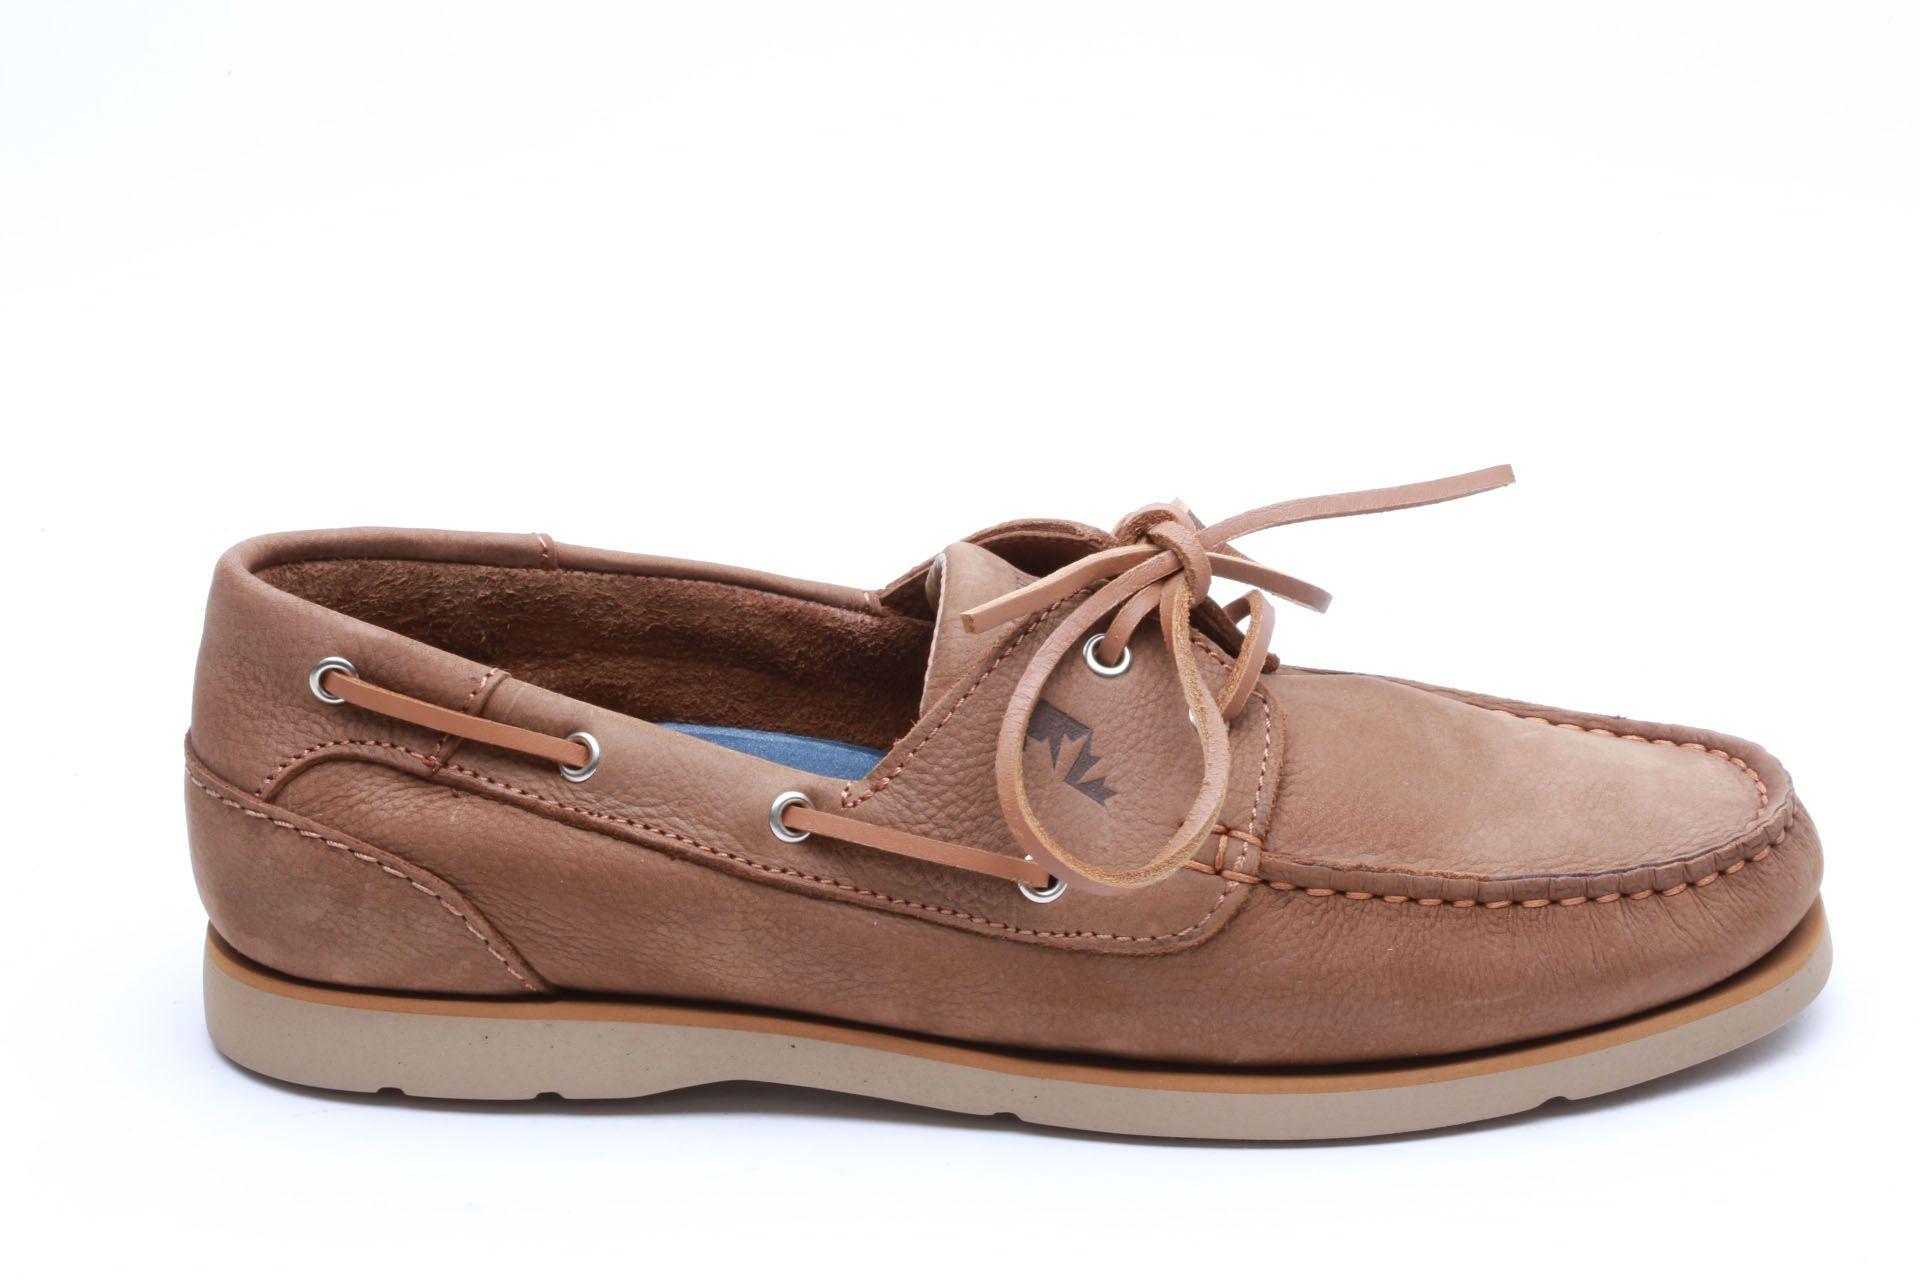 scarpe lumberjack anni 80